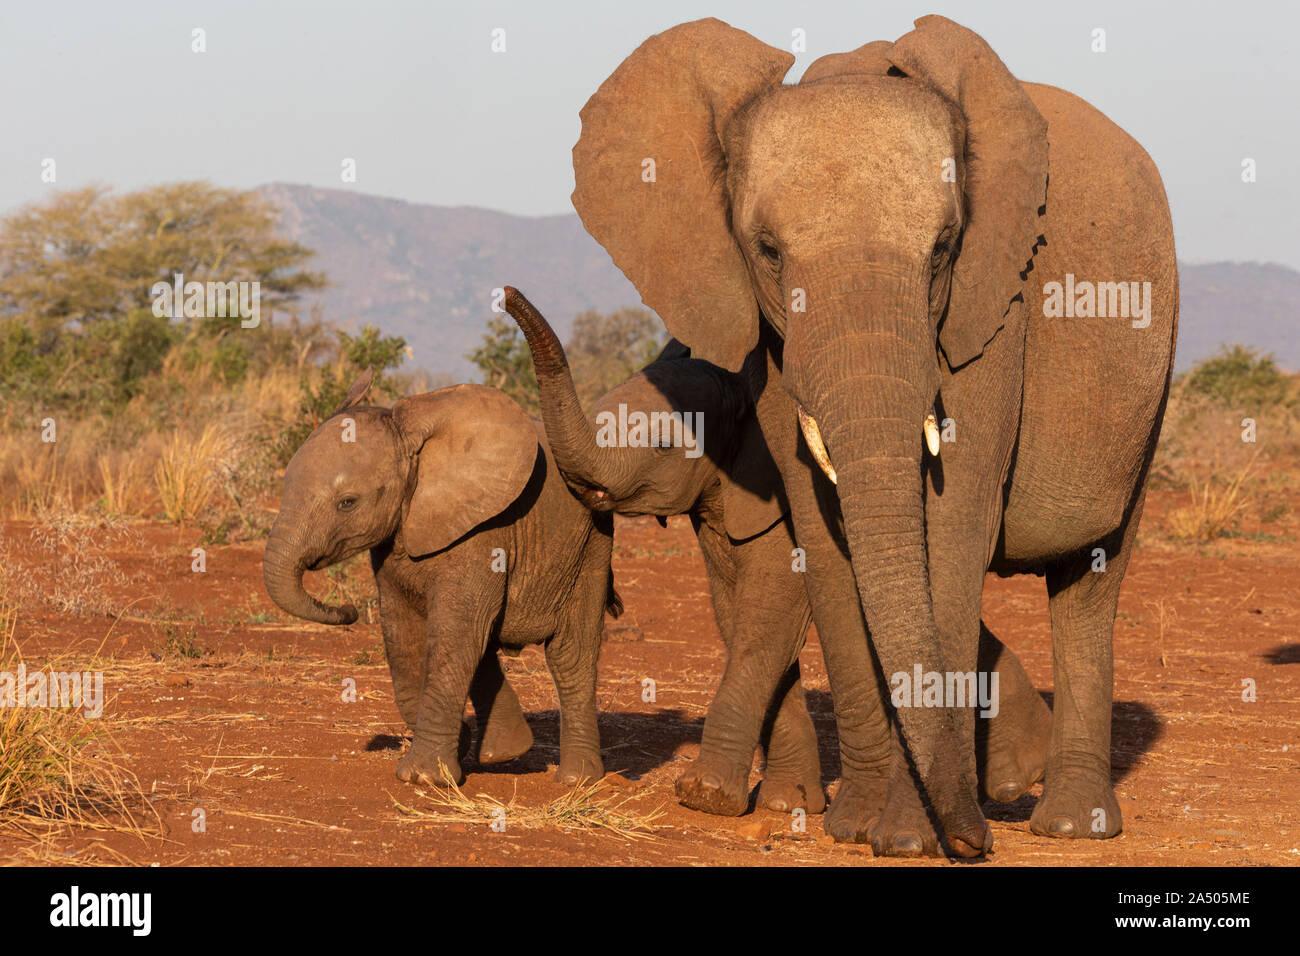 African elephants (Loxodonta africana), Zimanga game reserve, KwaZulu-Natal, South Africa Stock Photo